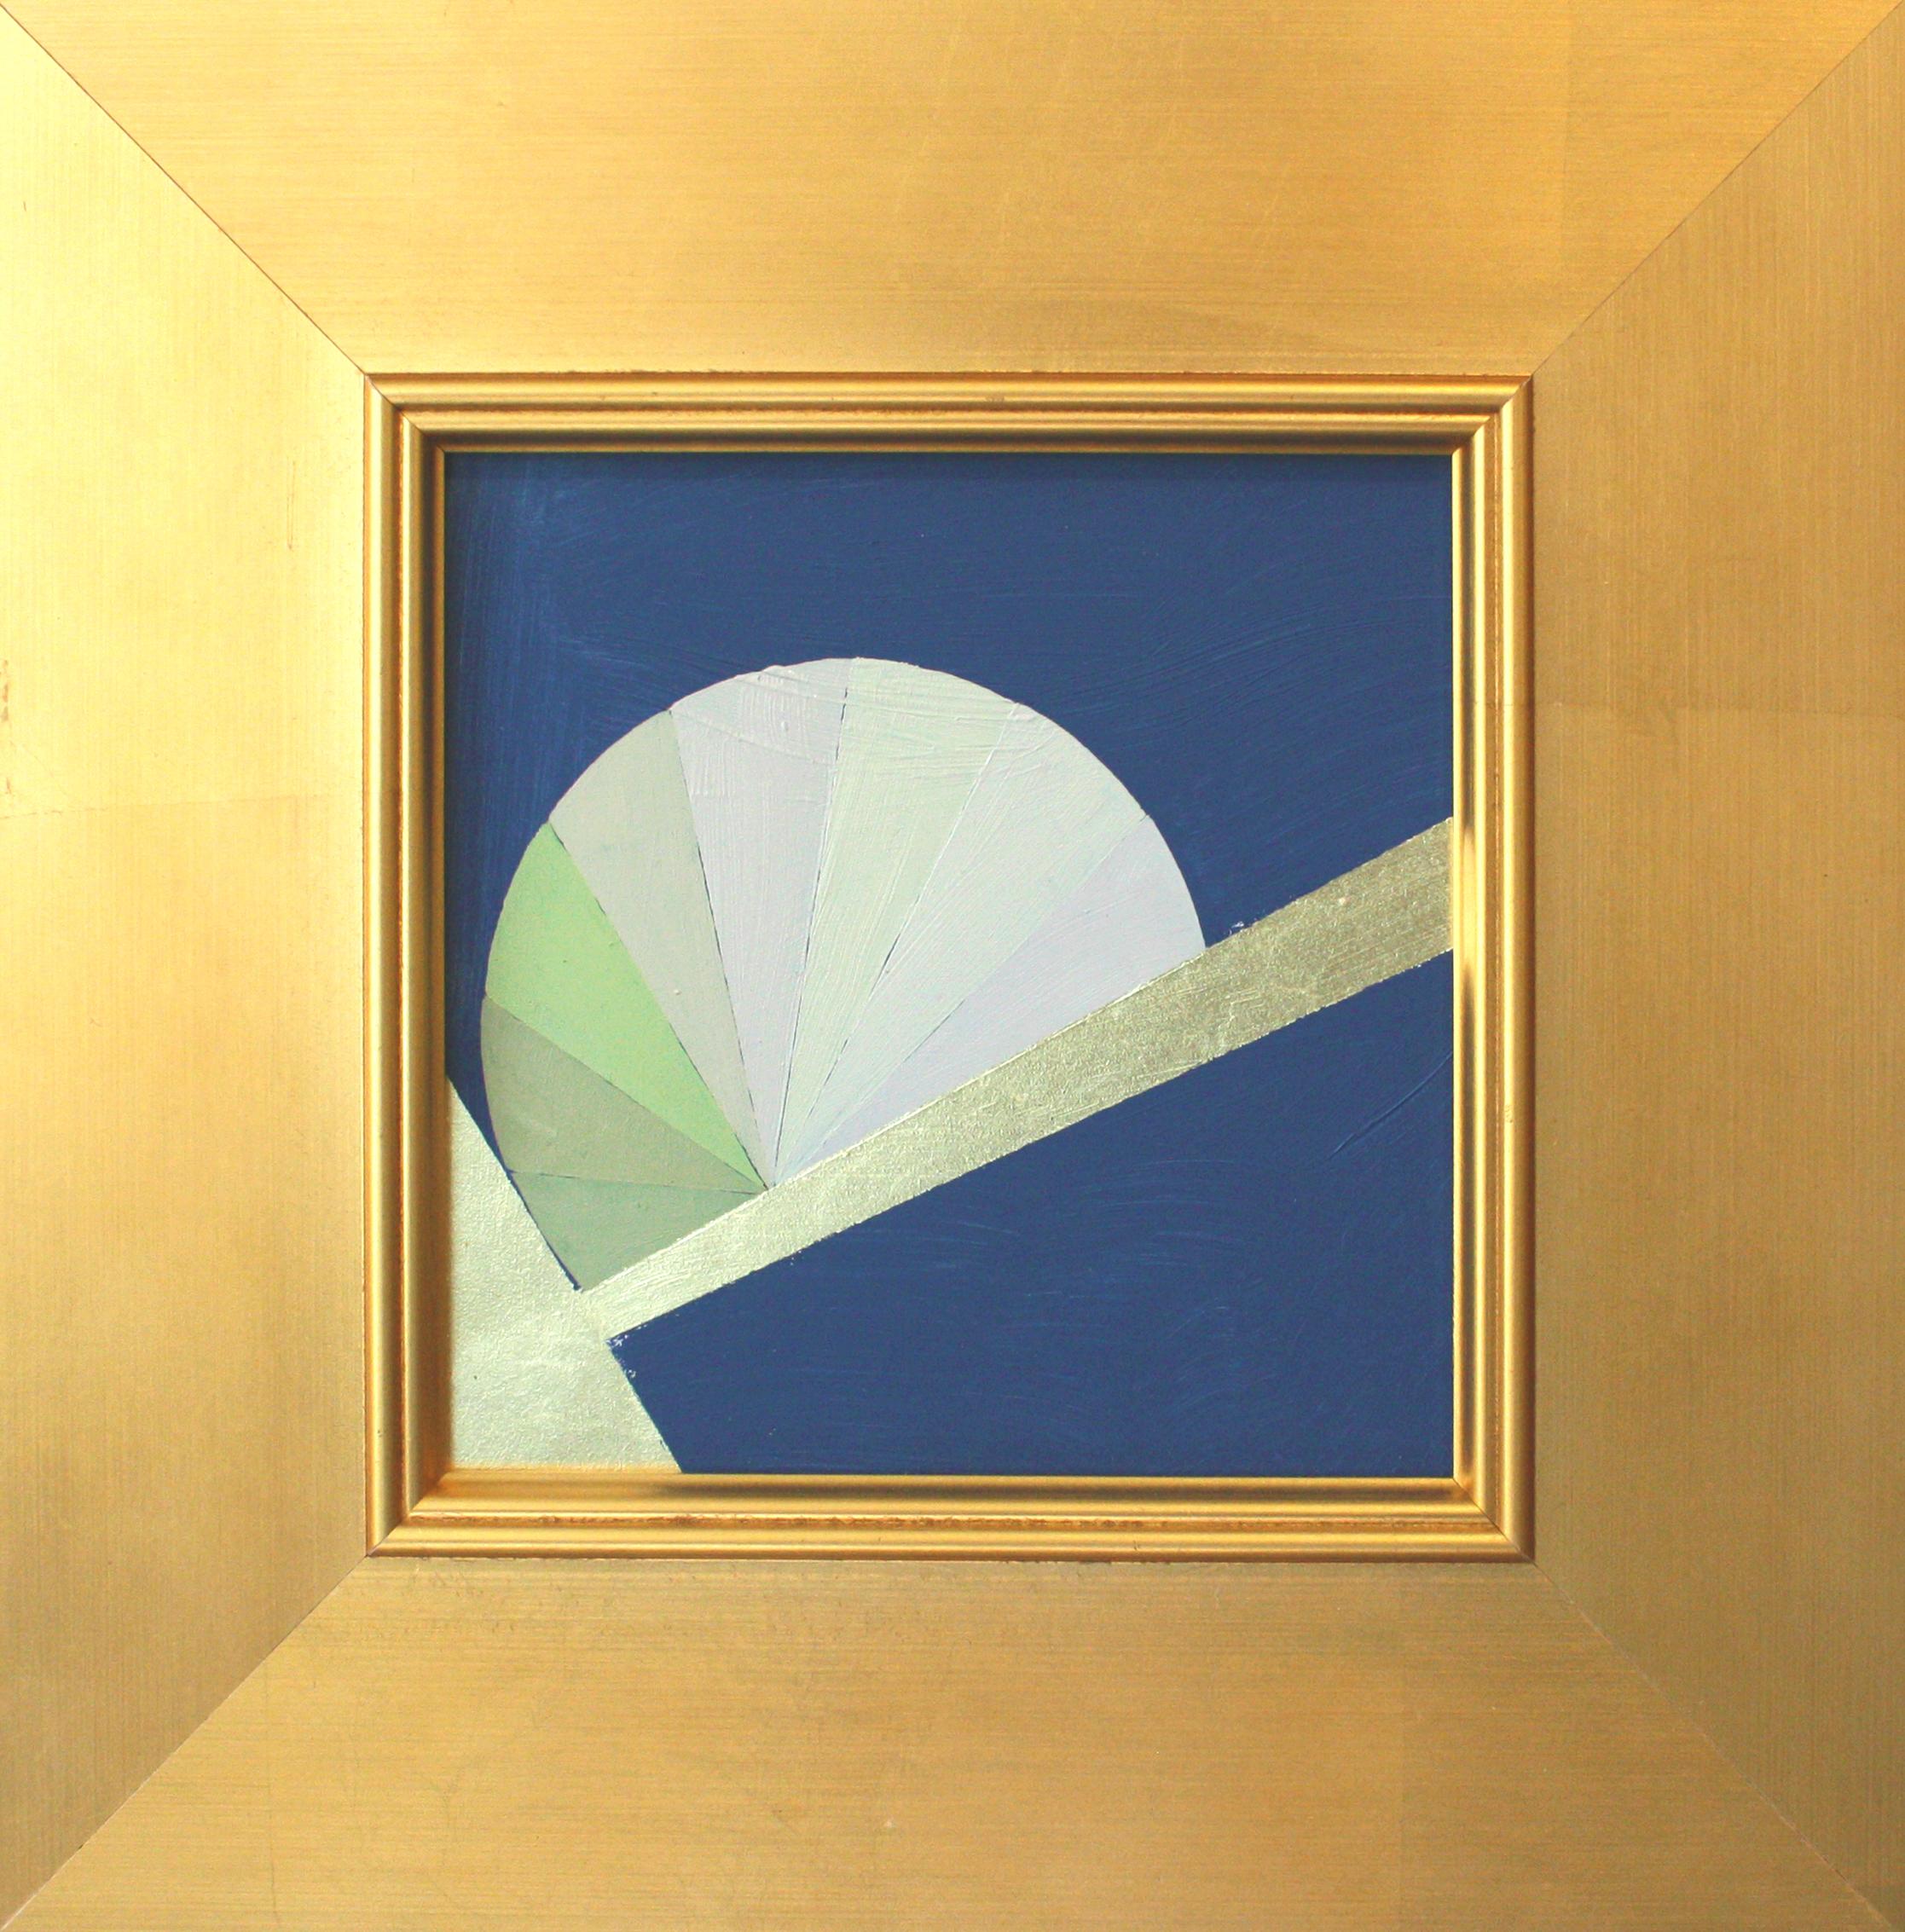 "Mantra H - 6"" x 6"" oil and gold leaf on panel, framed$450 | ON LOAN"